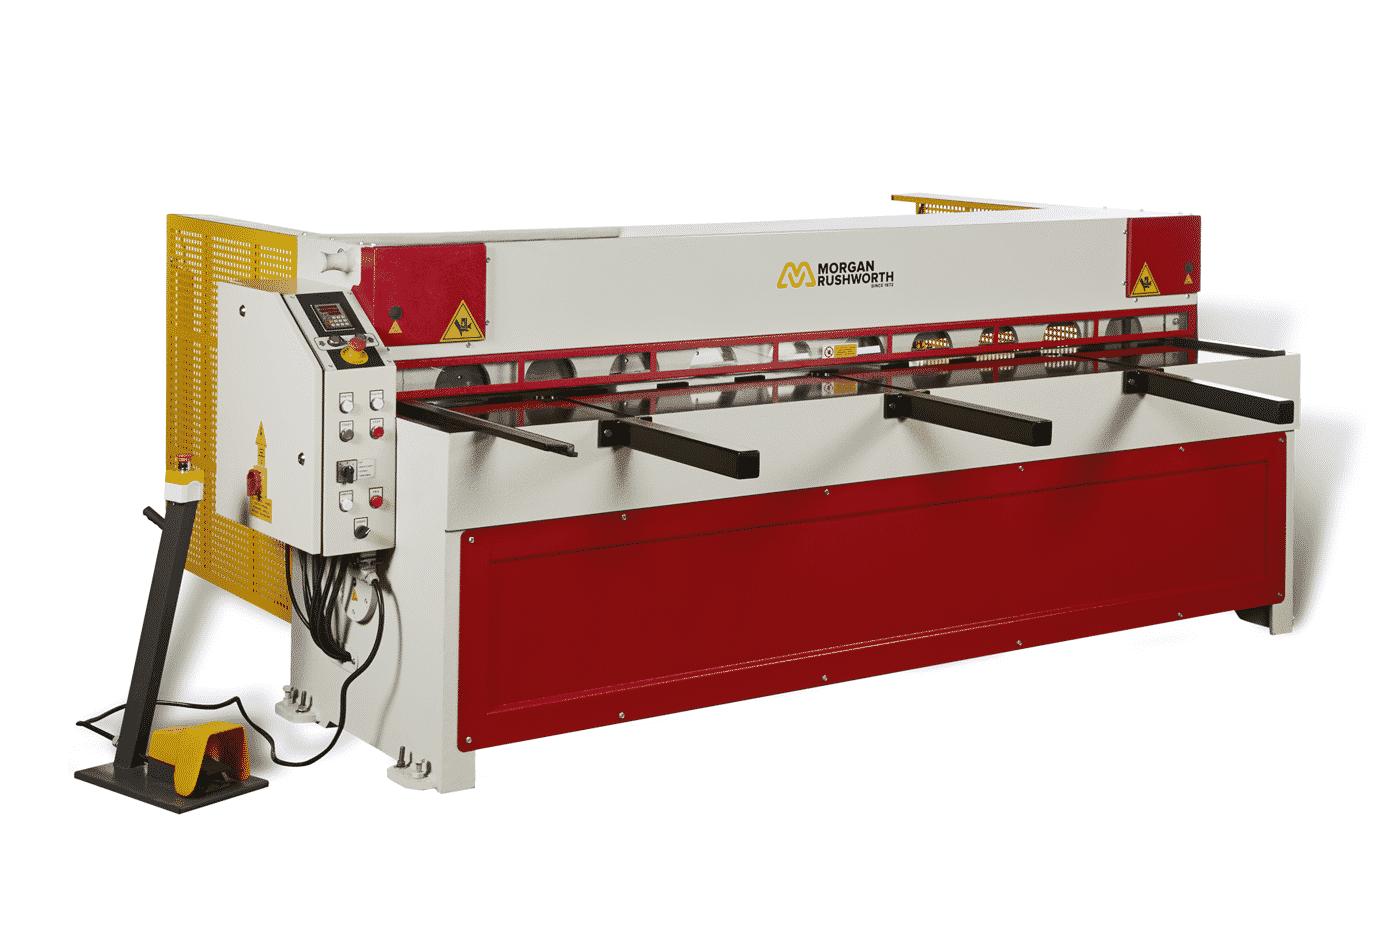 Morgan Rushworth Rgms Mechanical Guillotine Shear 415v